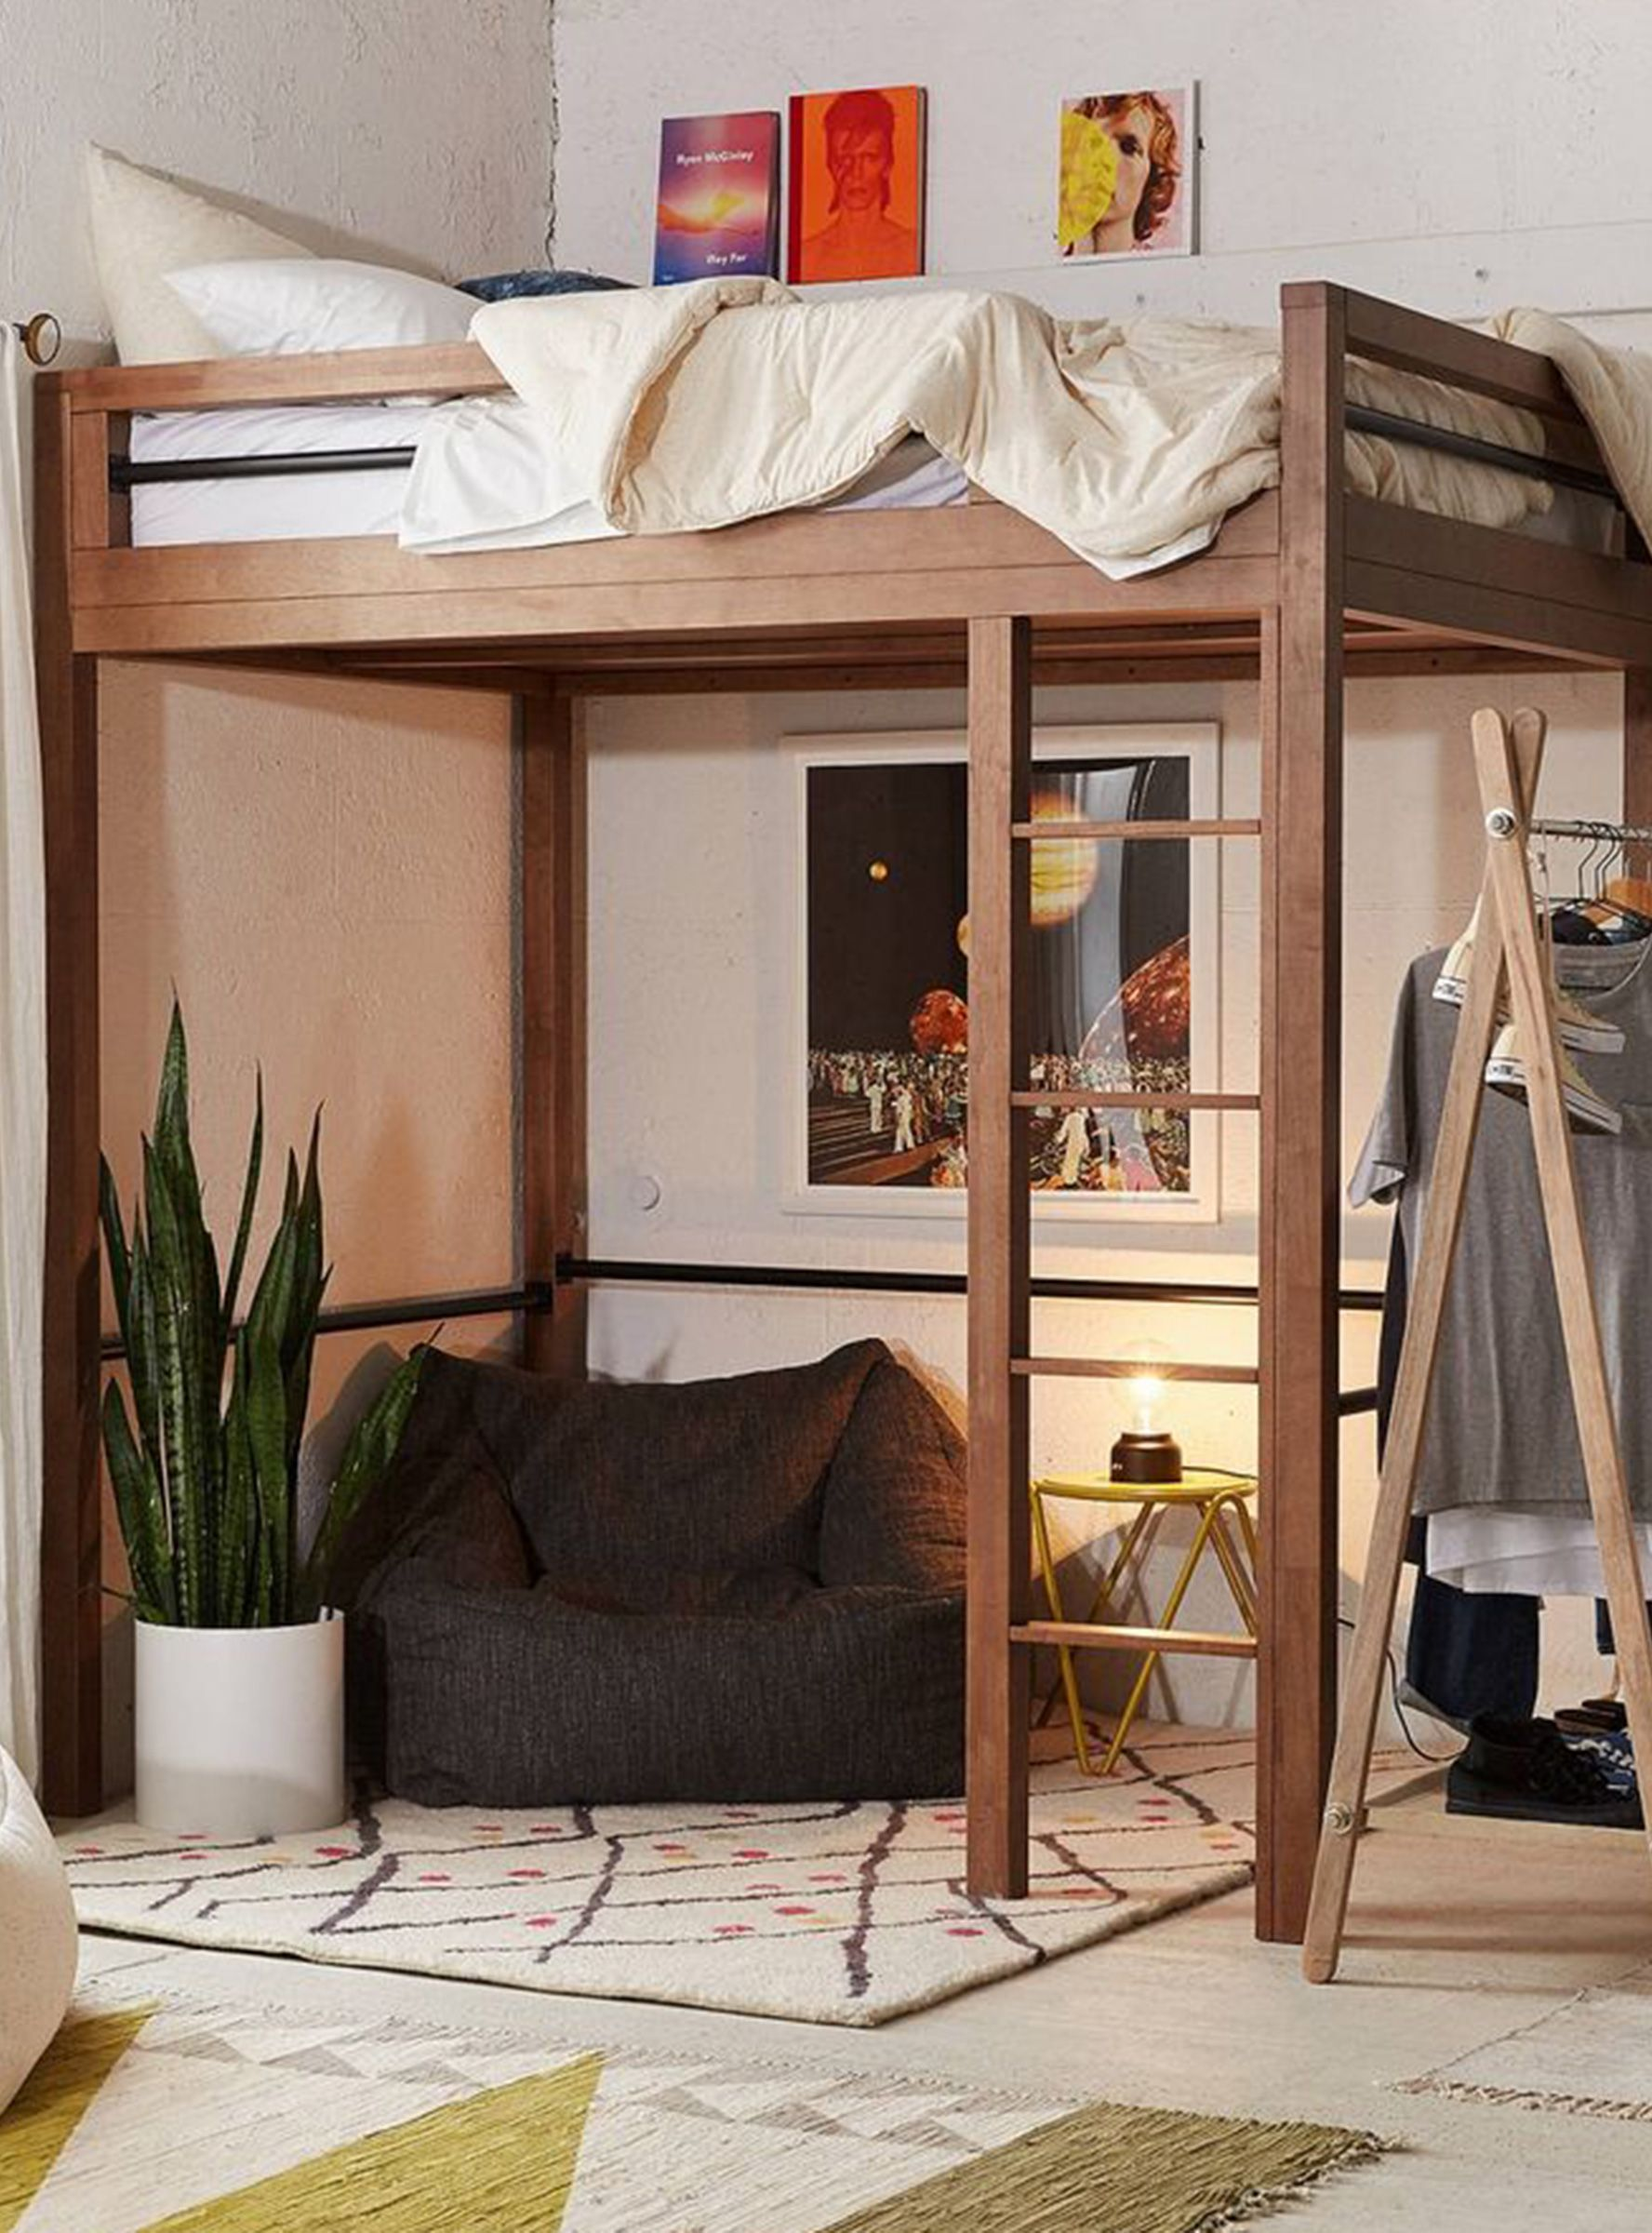 Urban loft bedroom   Decorating Ideas For Your GrownUp Loft Bed  Shelter  Bedrooms